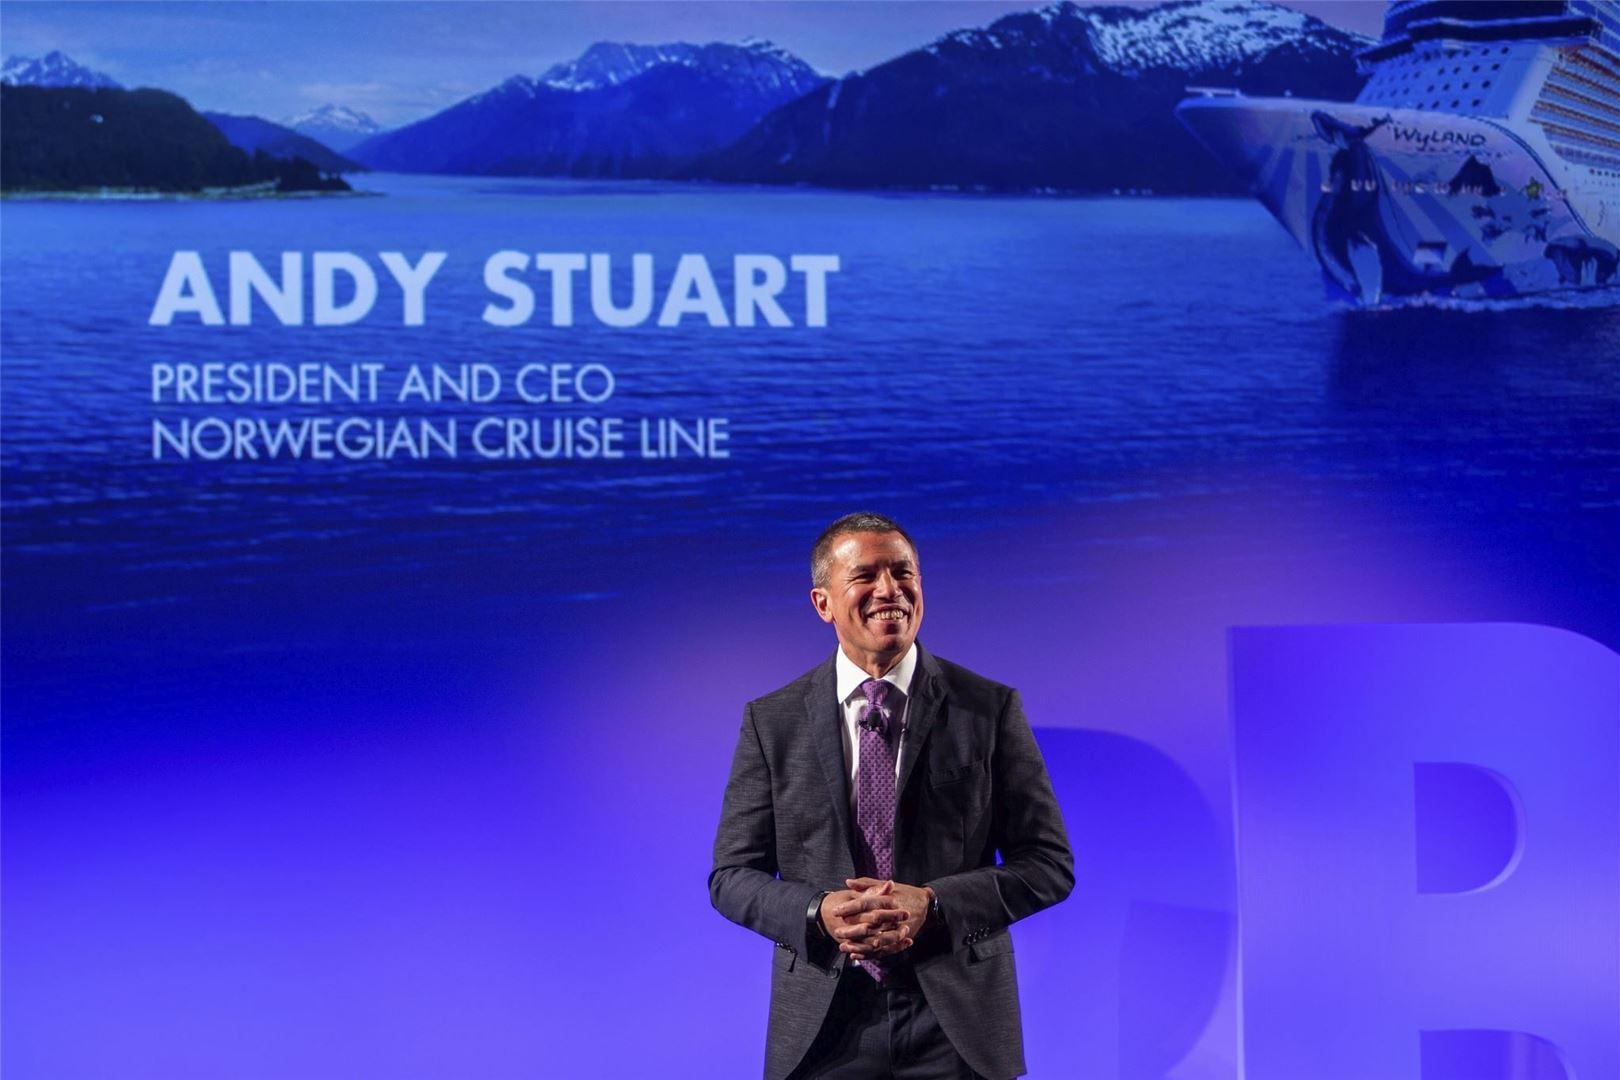 Former Norwegian Cruise Line President Andy Stuart Joins Global Ports Holding